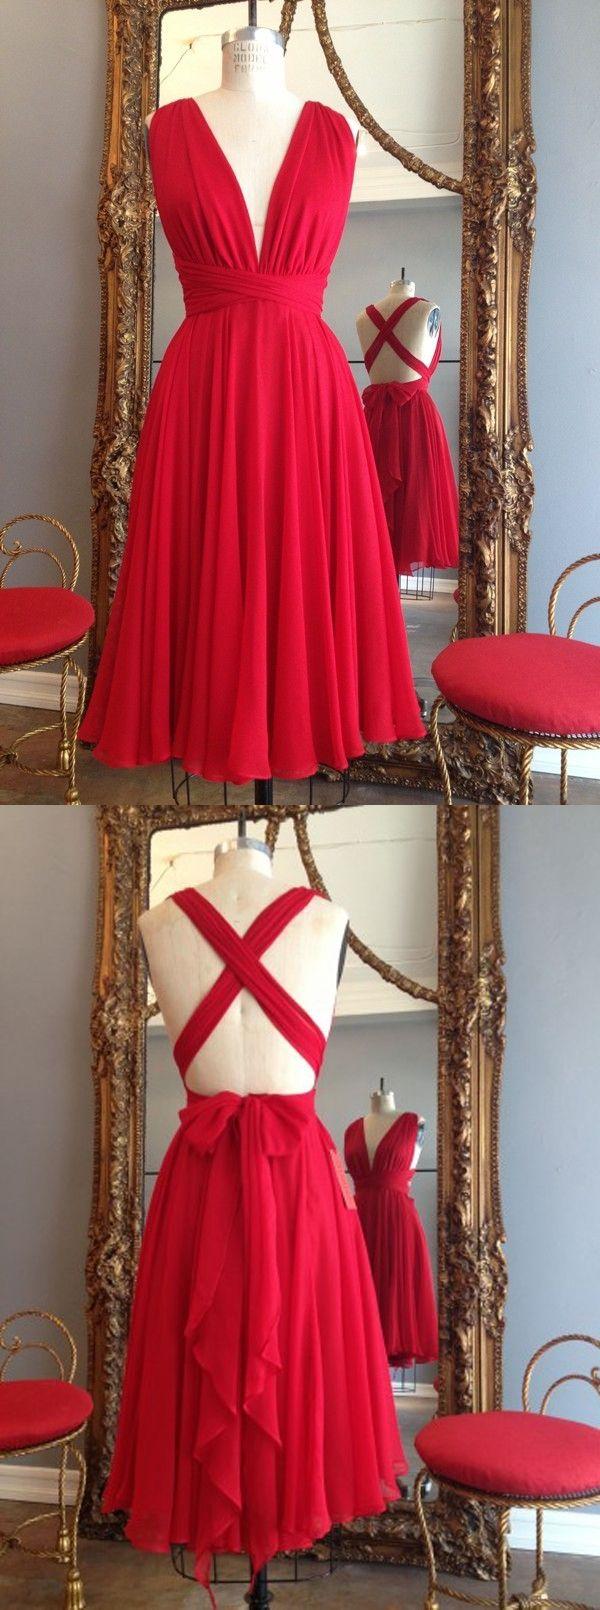 red bridesmaid dresses, hot bridesmaid dresses, v neck bridesmaid dresses, bridesmaid dresses, bridesmaid dresses with ruched, bridesmaid dress with bowknot